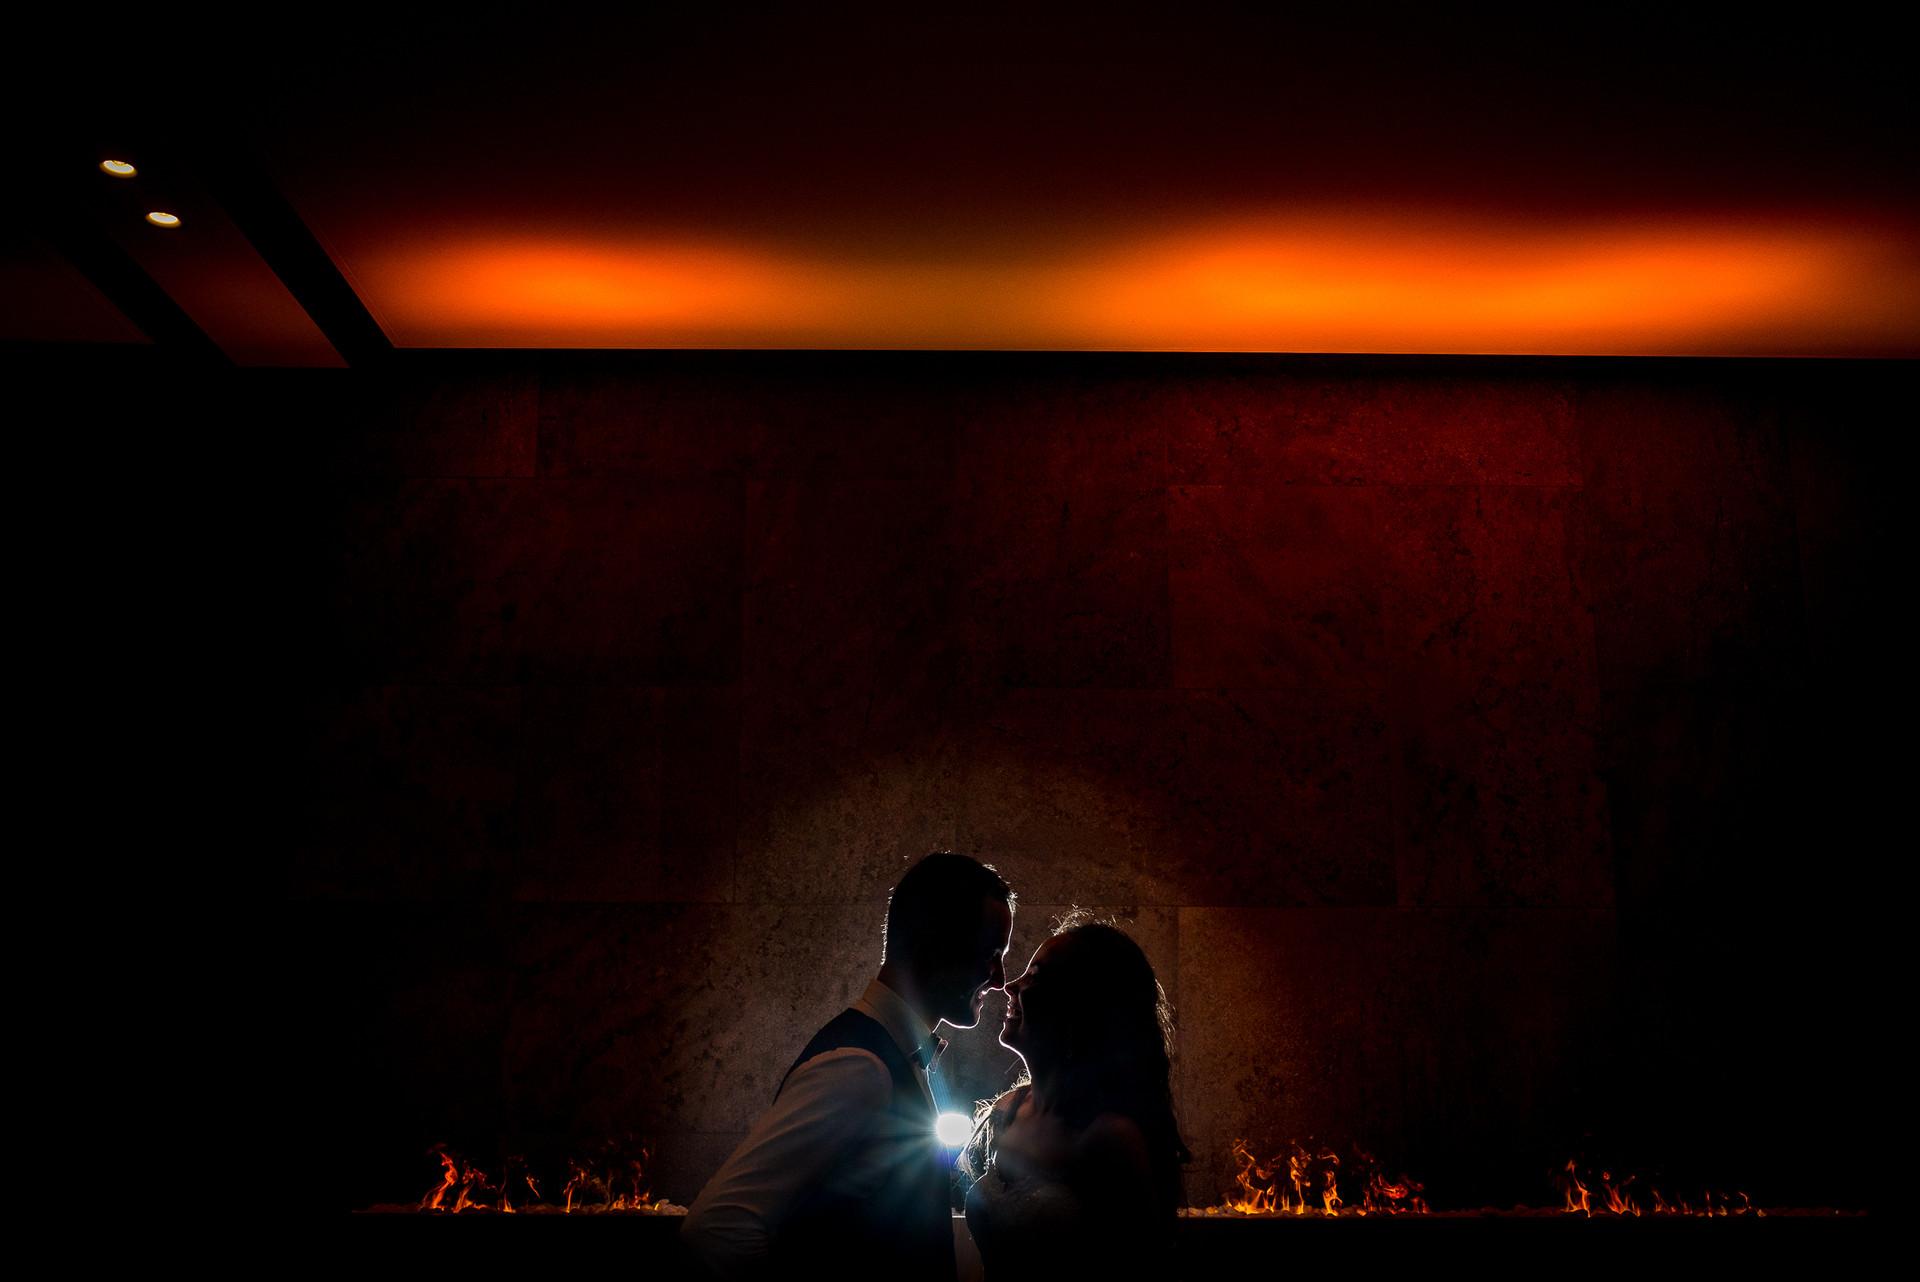 huwelijksfotograaf Saint Germain Diksmuide